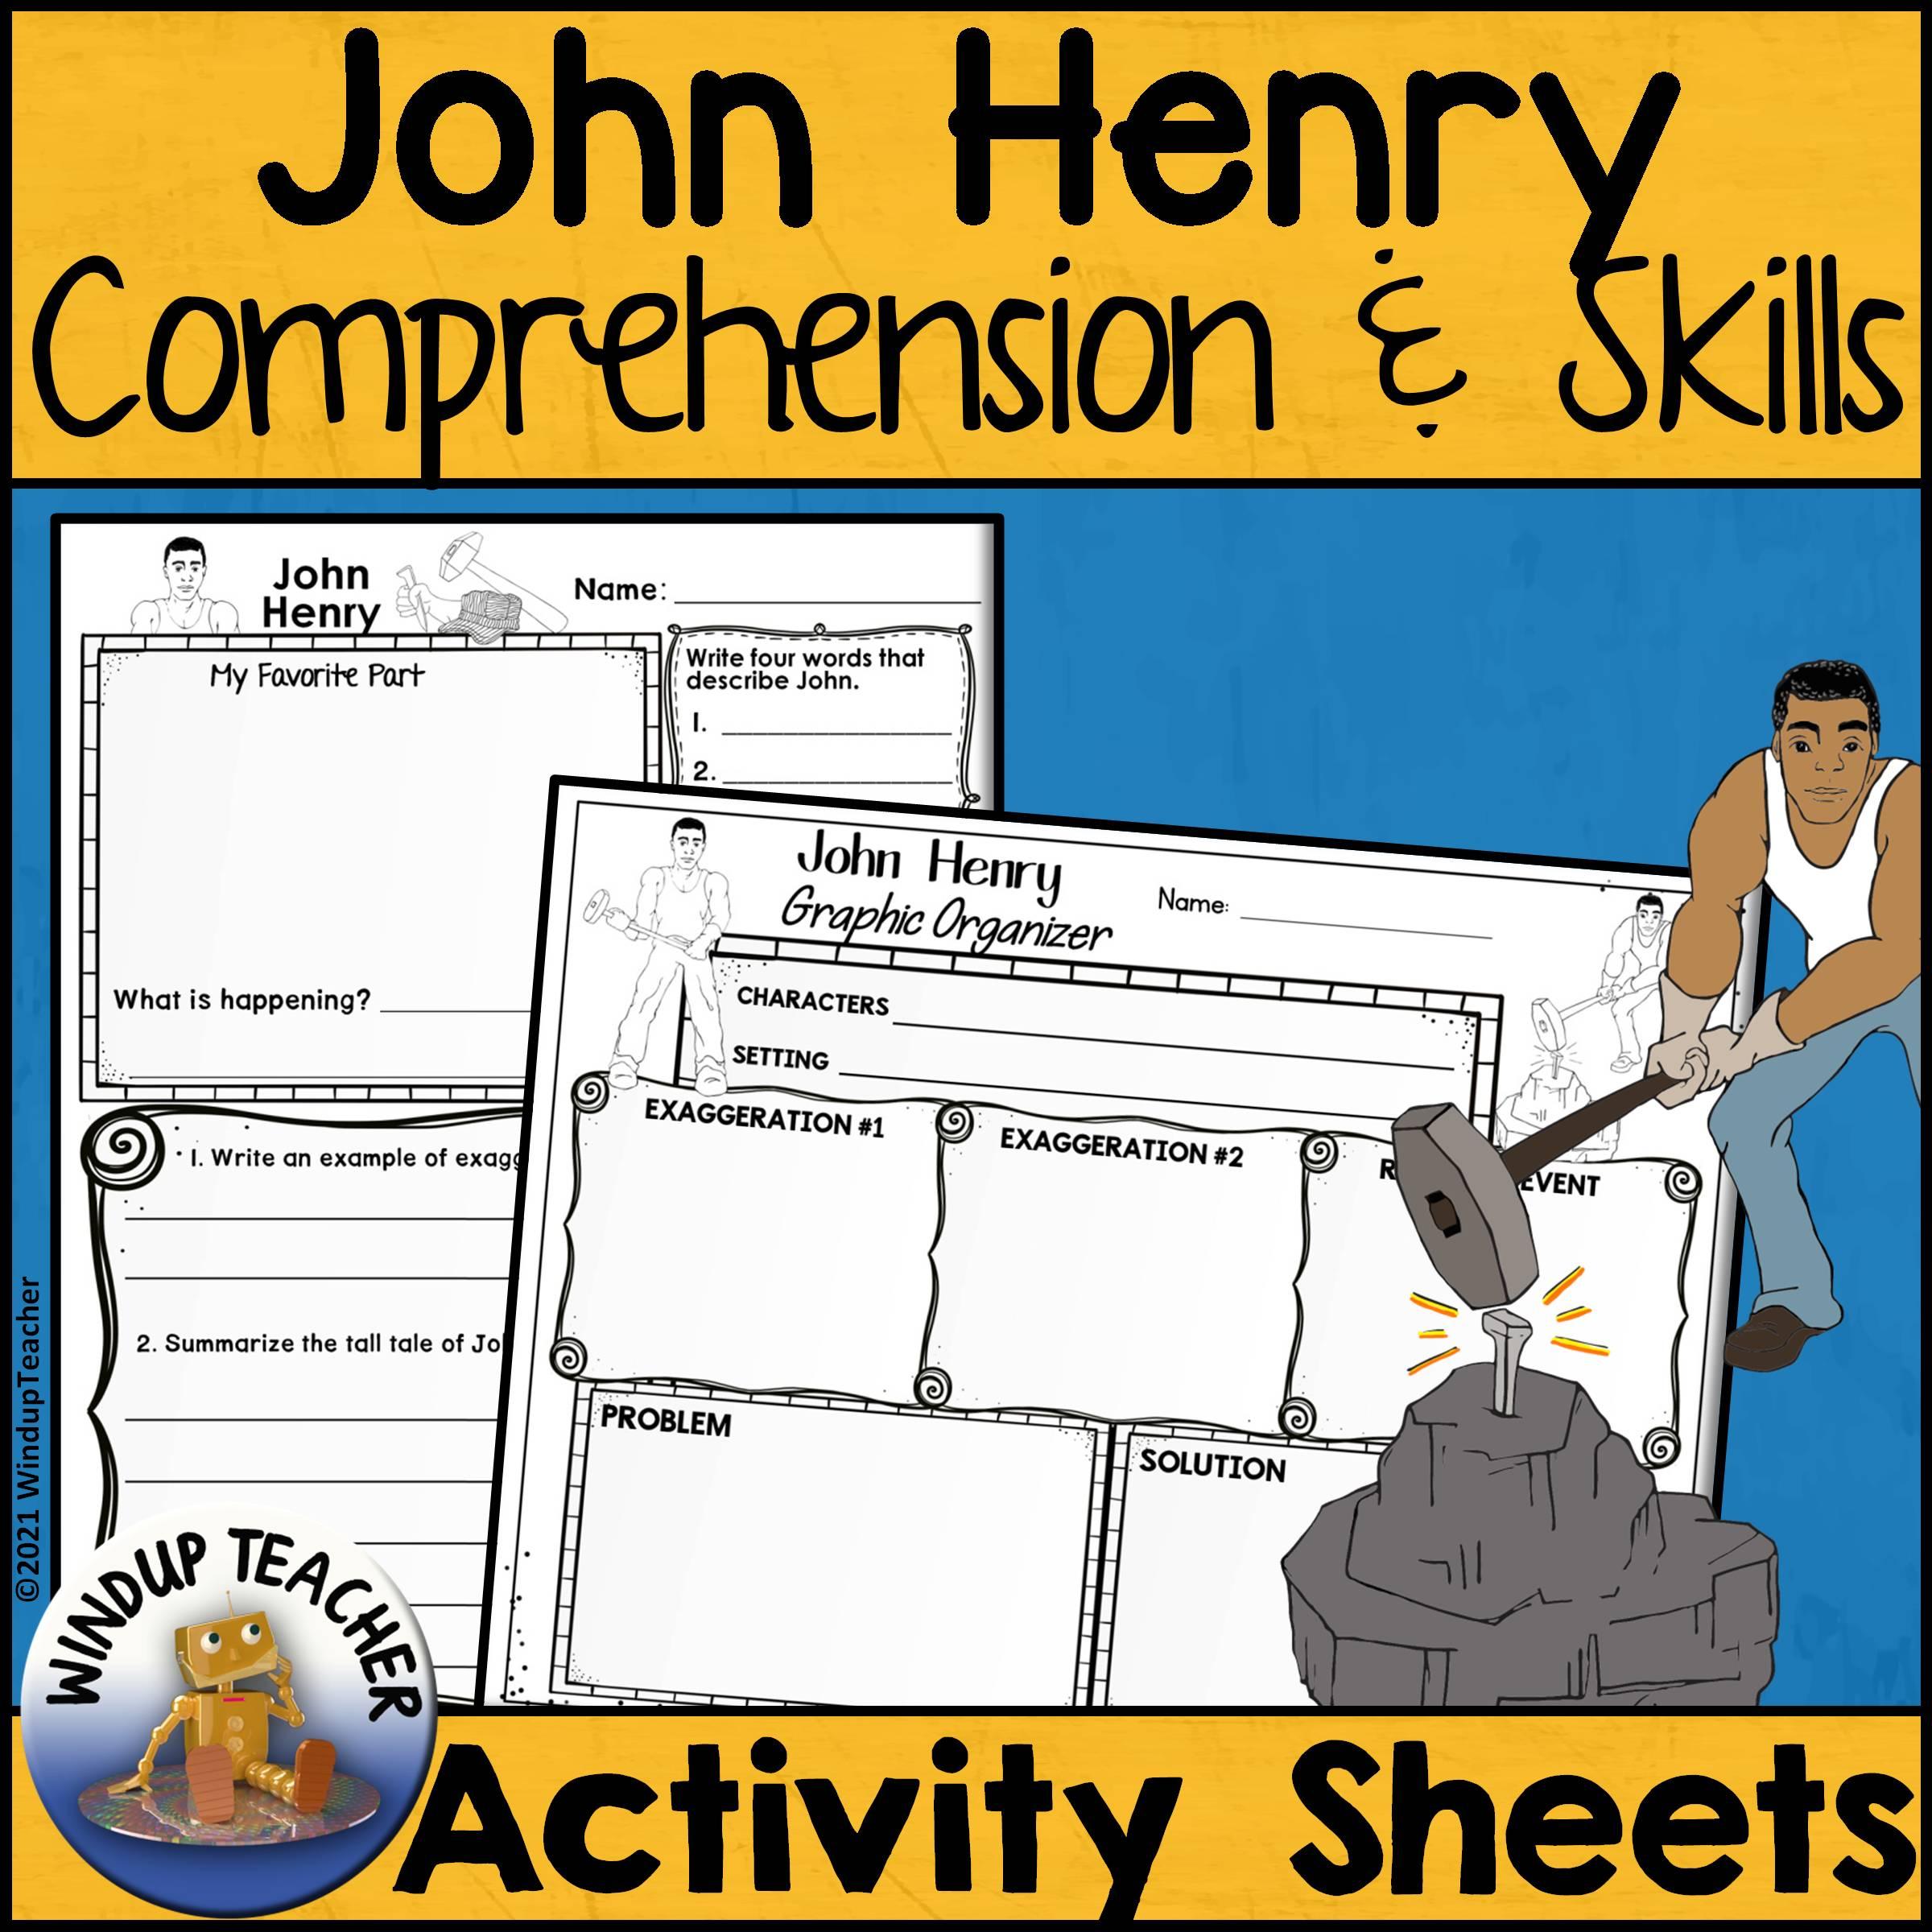 John Henry Activity Sheets | Print and Go!